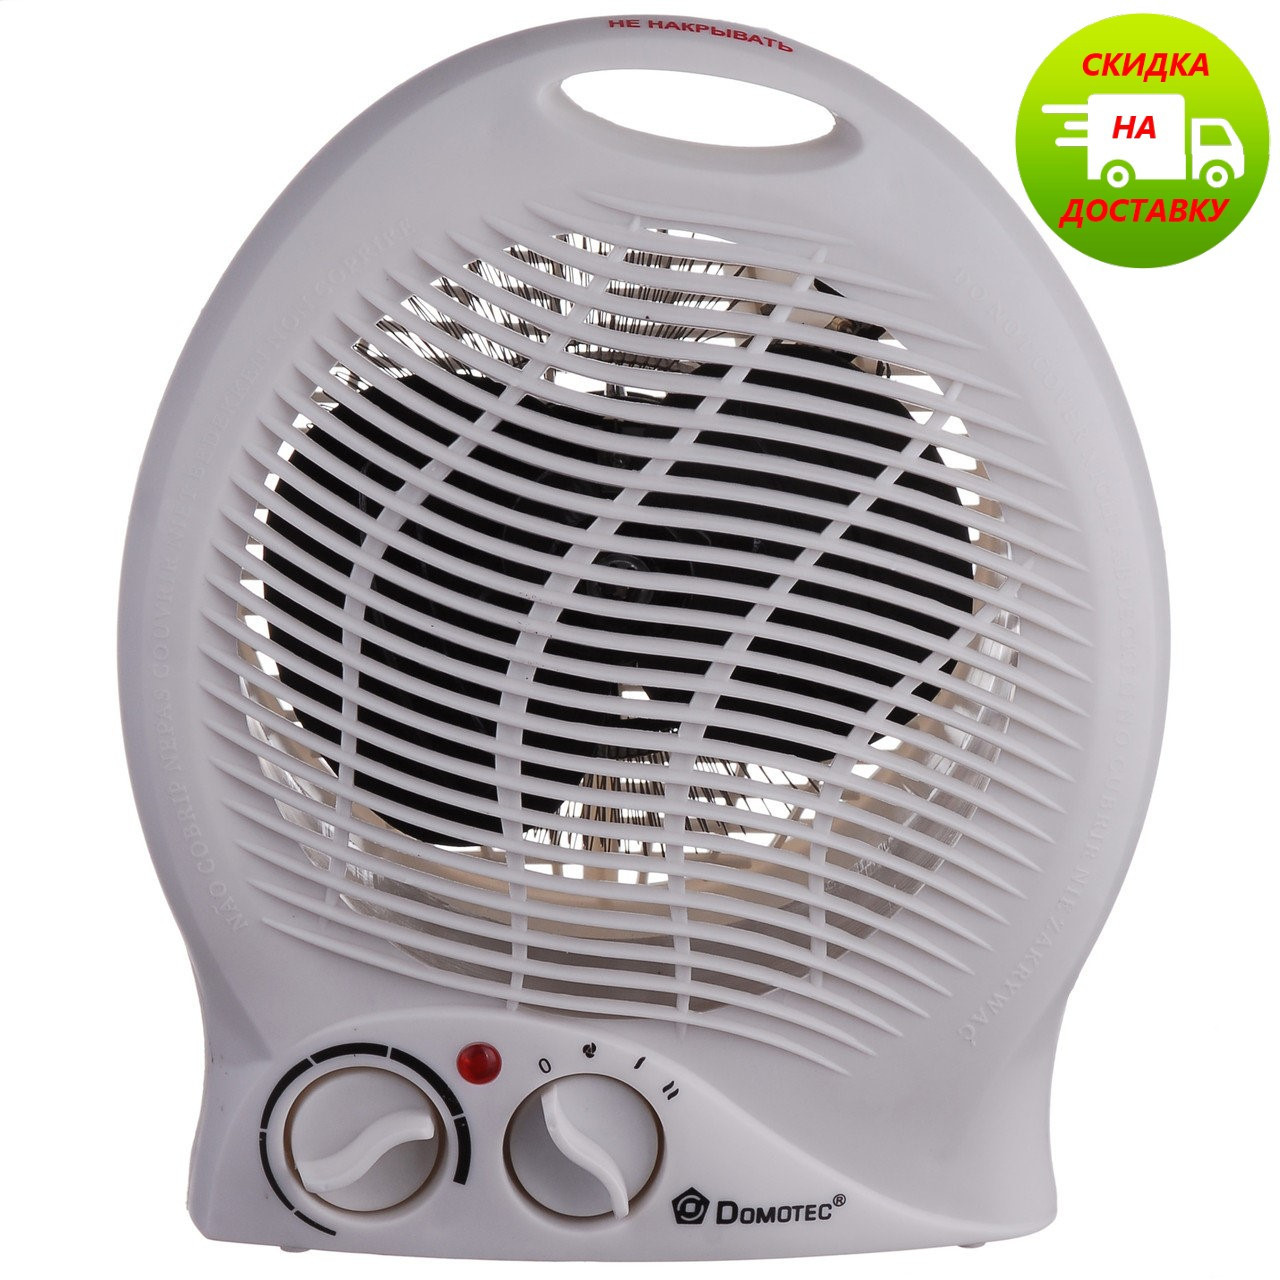 Тепловентилятор | обогреватель | калорифер | дуйка  Domotec MS-5902 (2000 W)